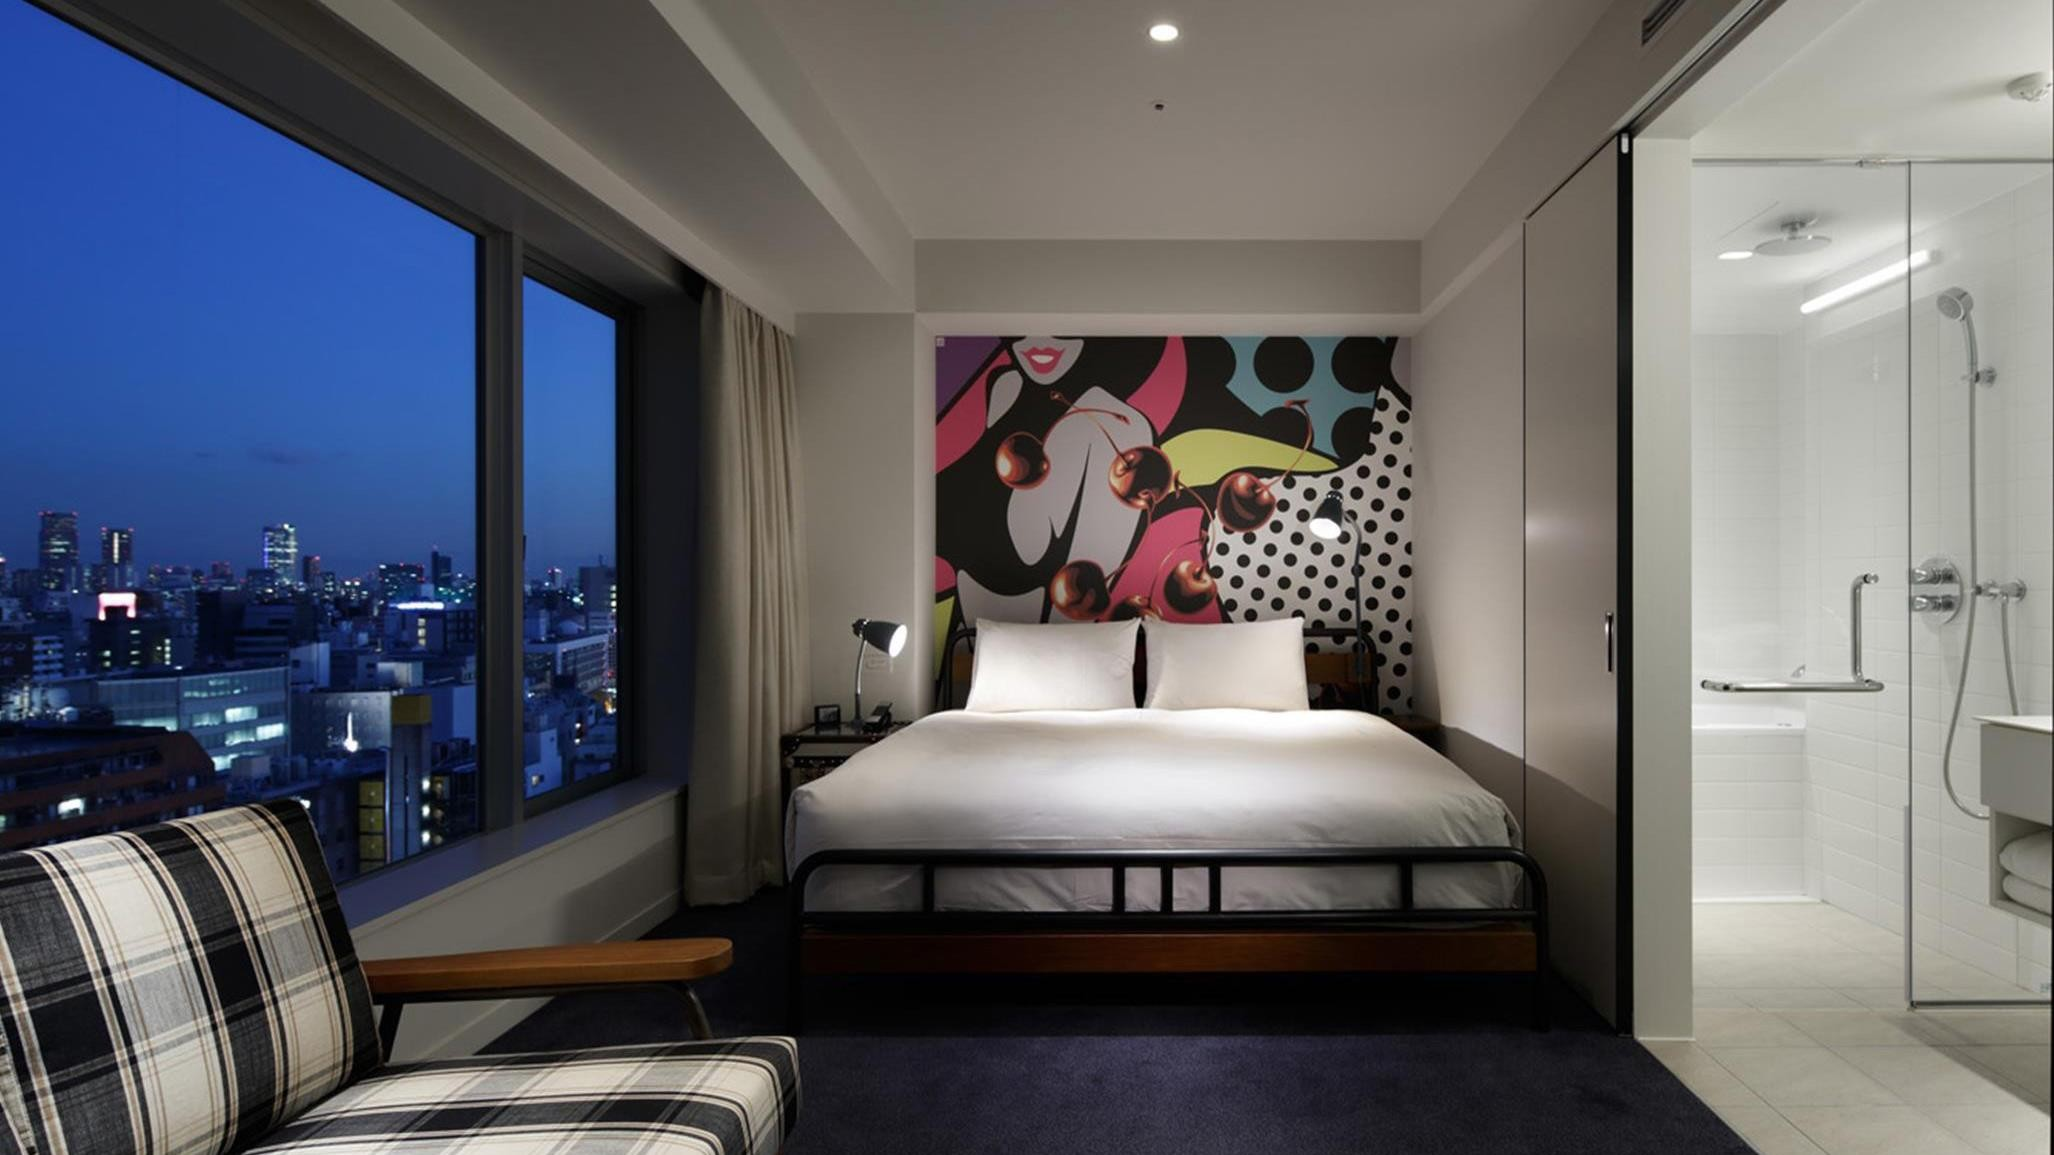 Boutique Hotel tokyo Shinjuku Beautiful Shinjuku Granbell Hotel In tokyo Best Hotel Rates Vossy